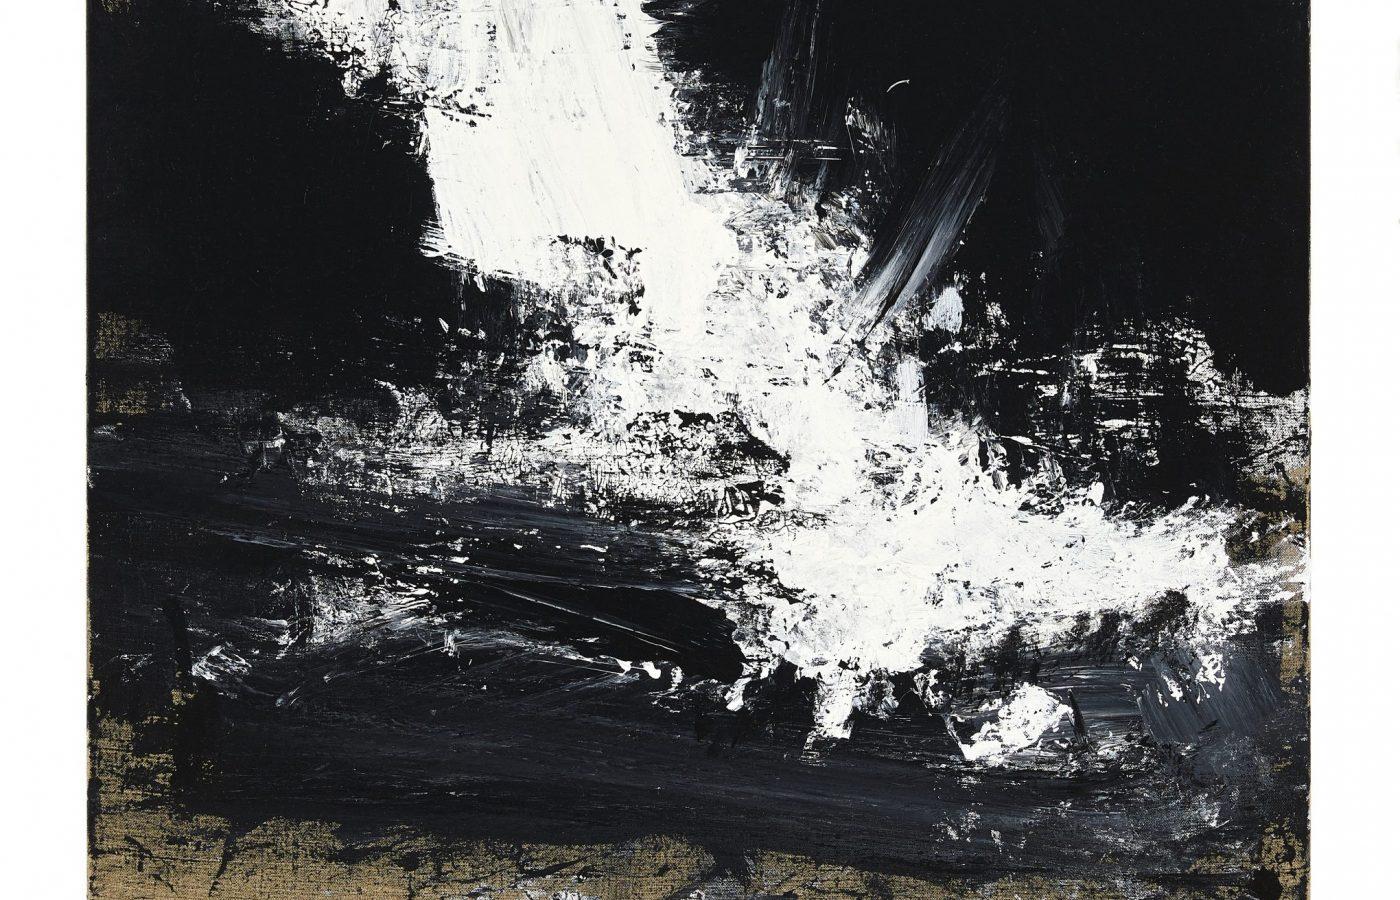 FXF18-57 John Virtue Untitled No 19 2016-17